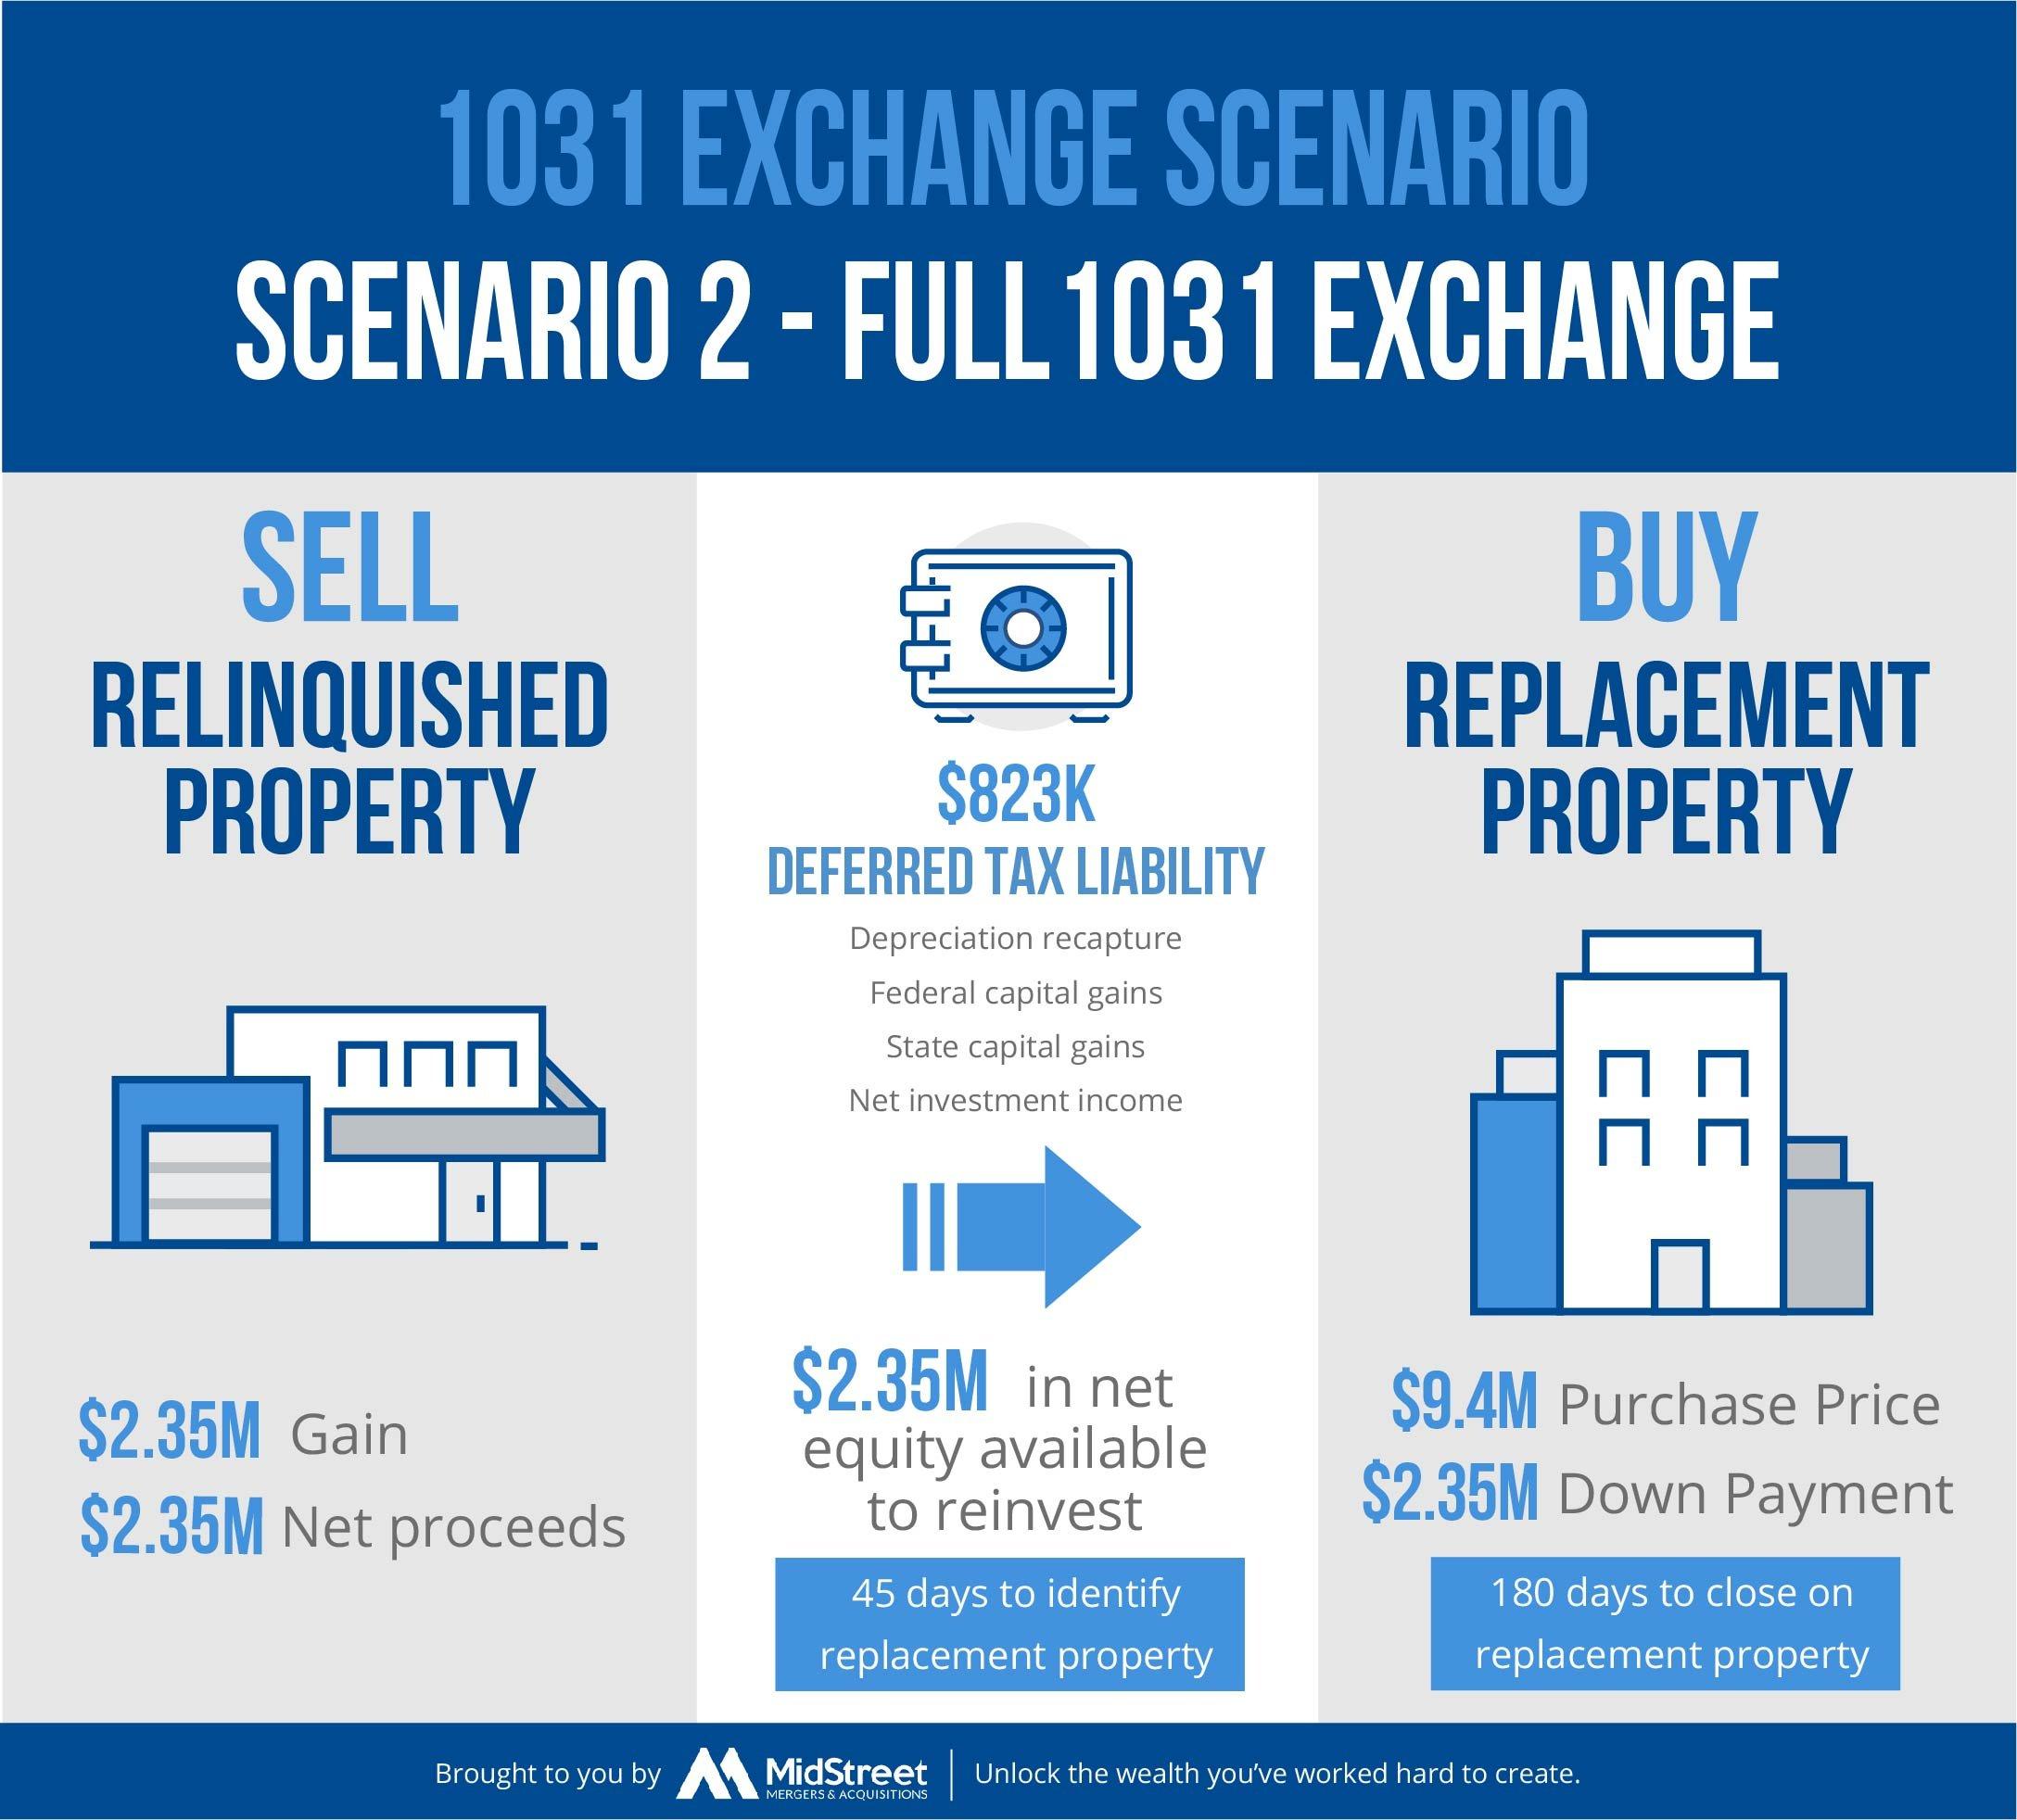 1031-Exchange Scenario 2